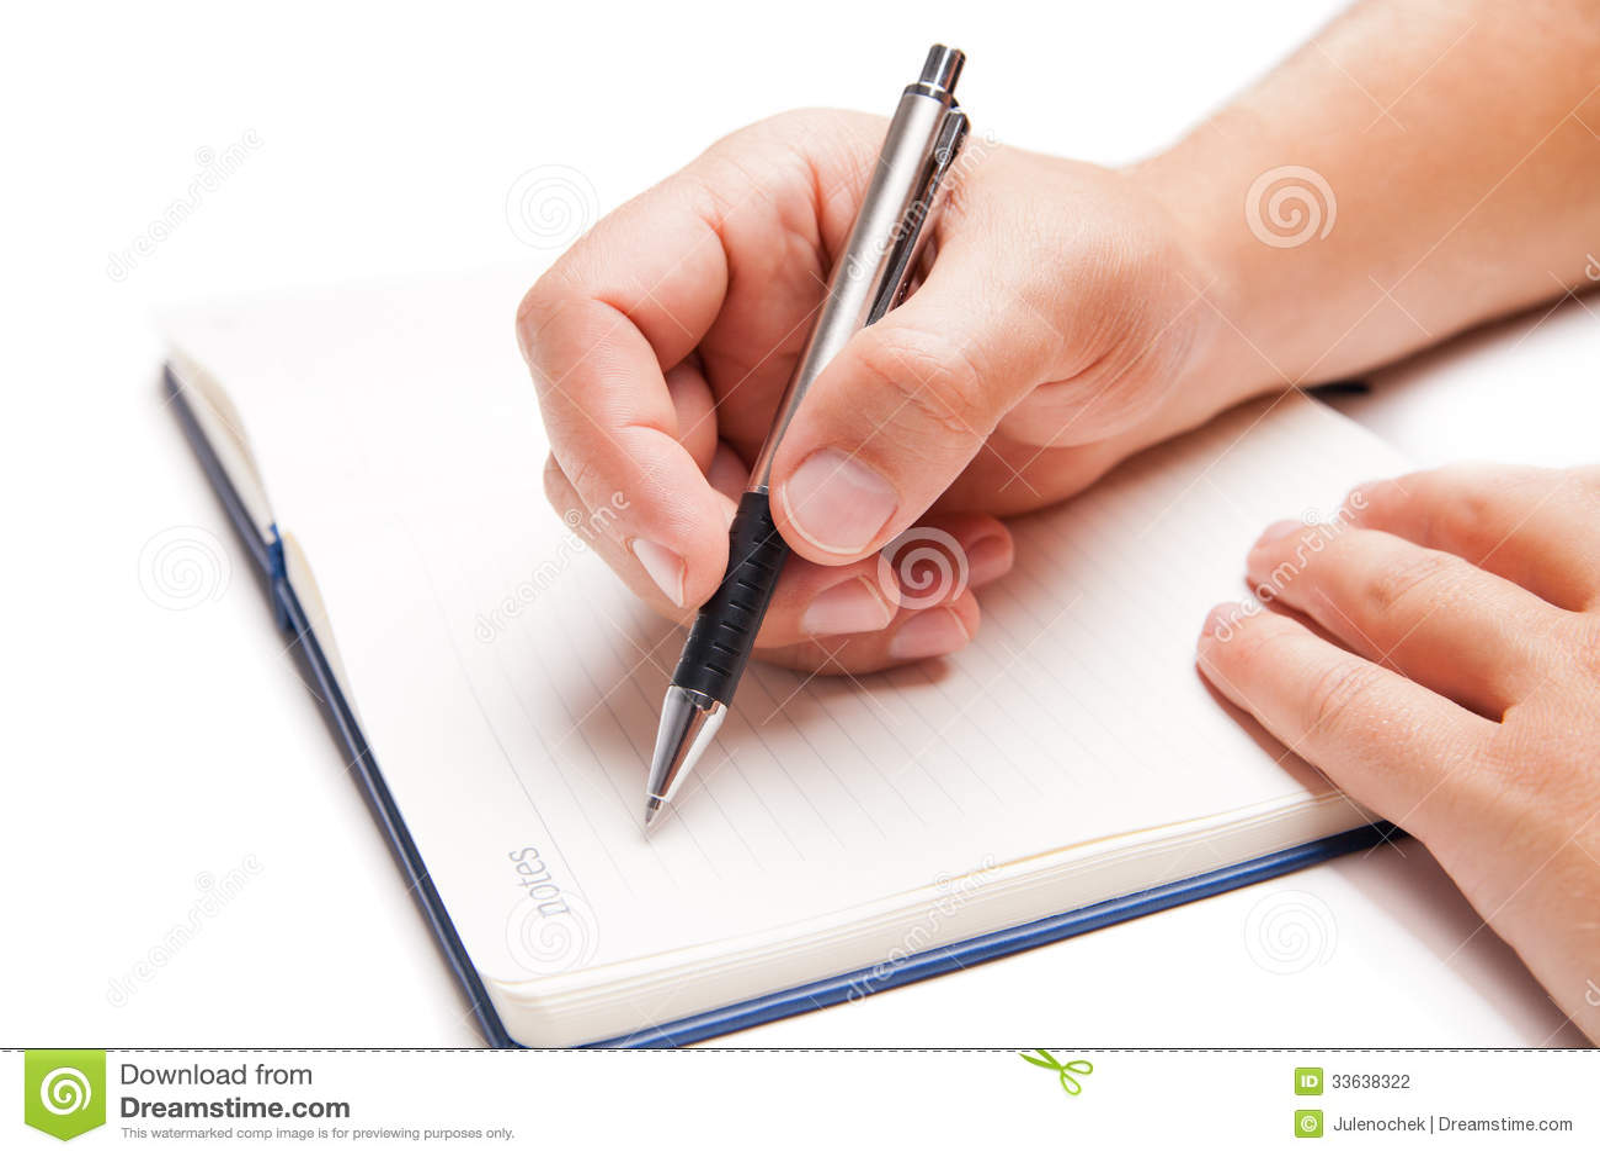 Paperclip man essay writer